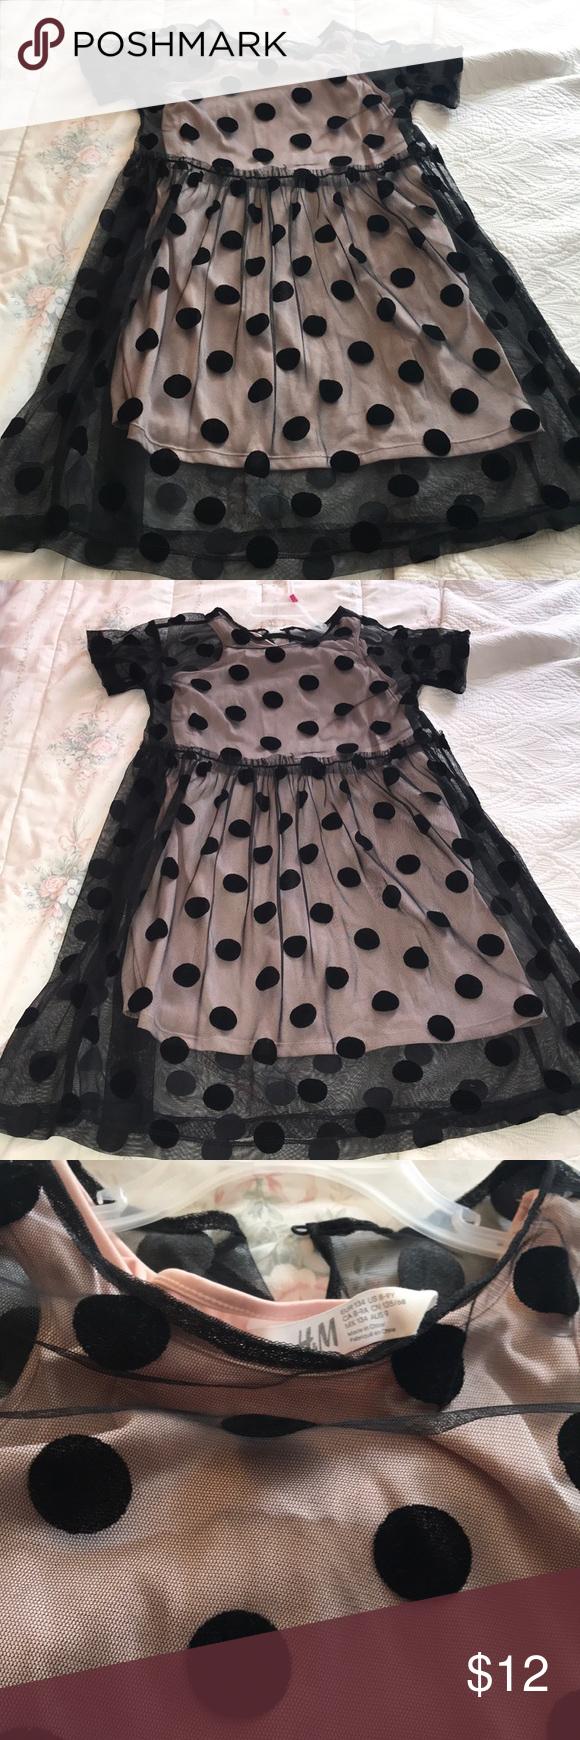 Hum little girl dress children cloths pinterest girls dresses